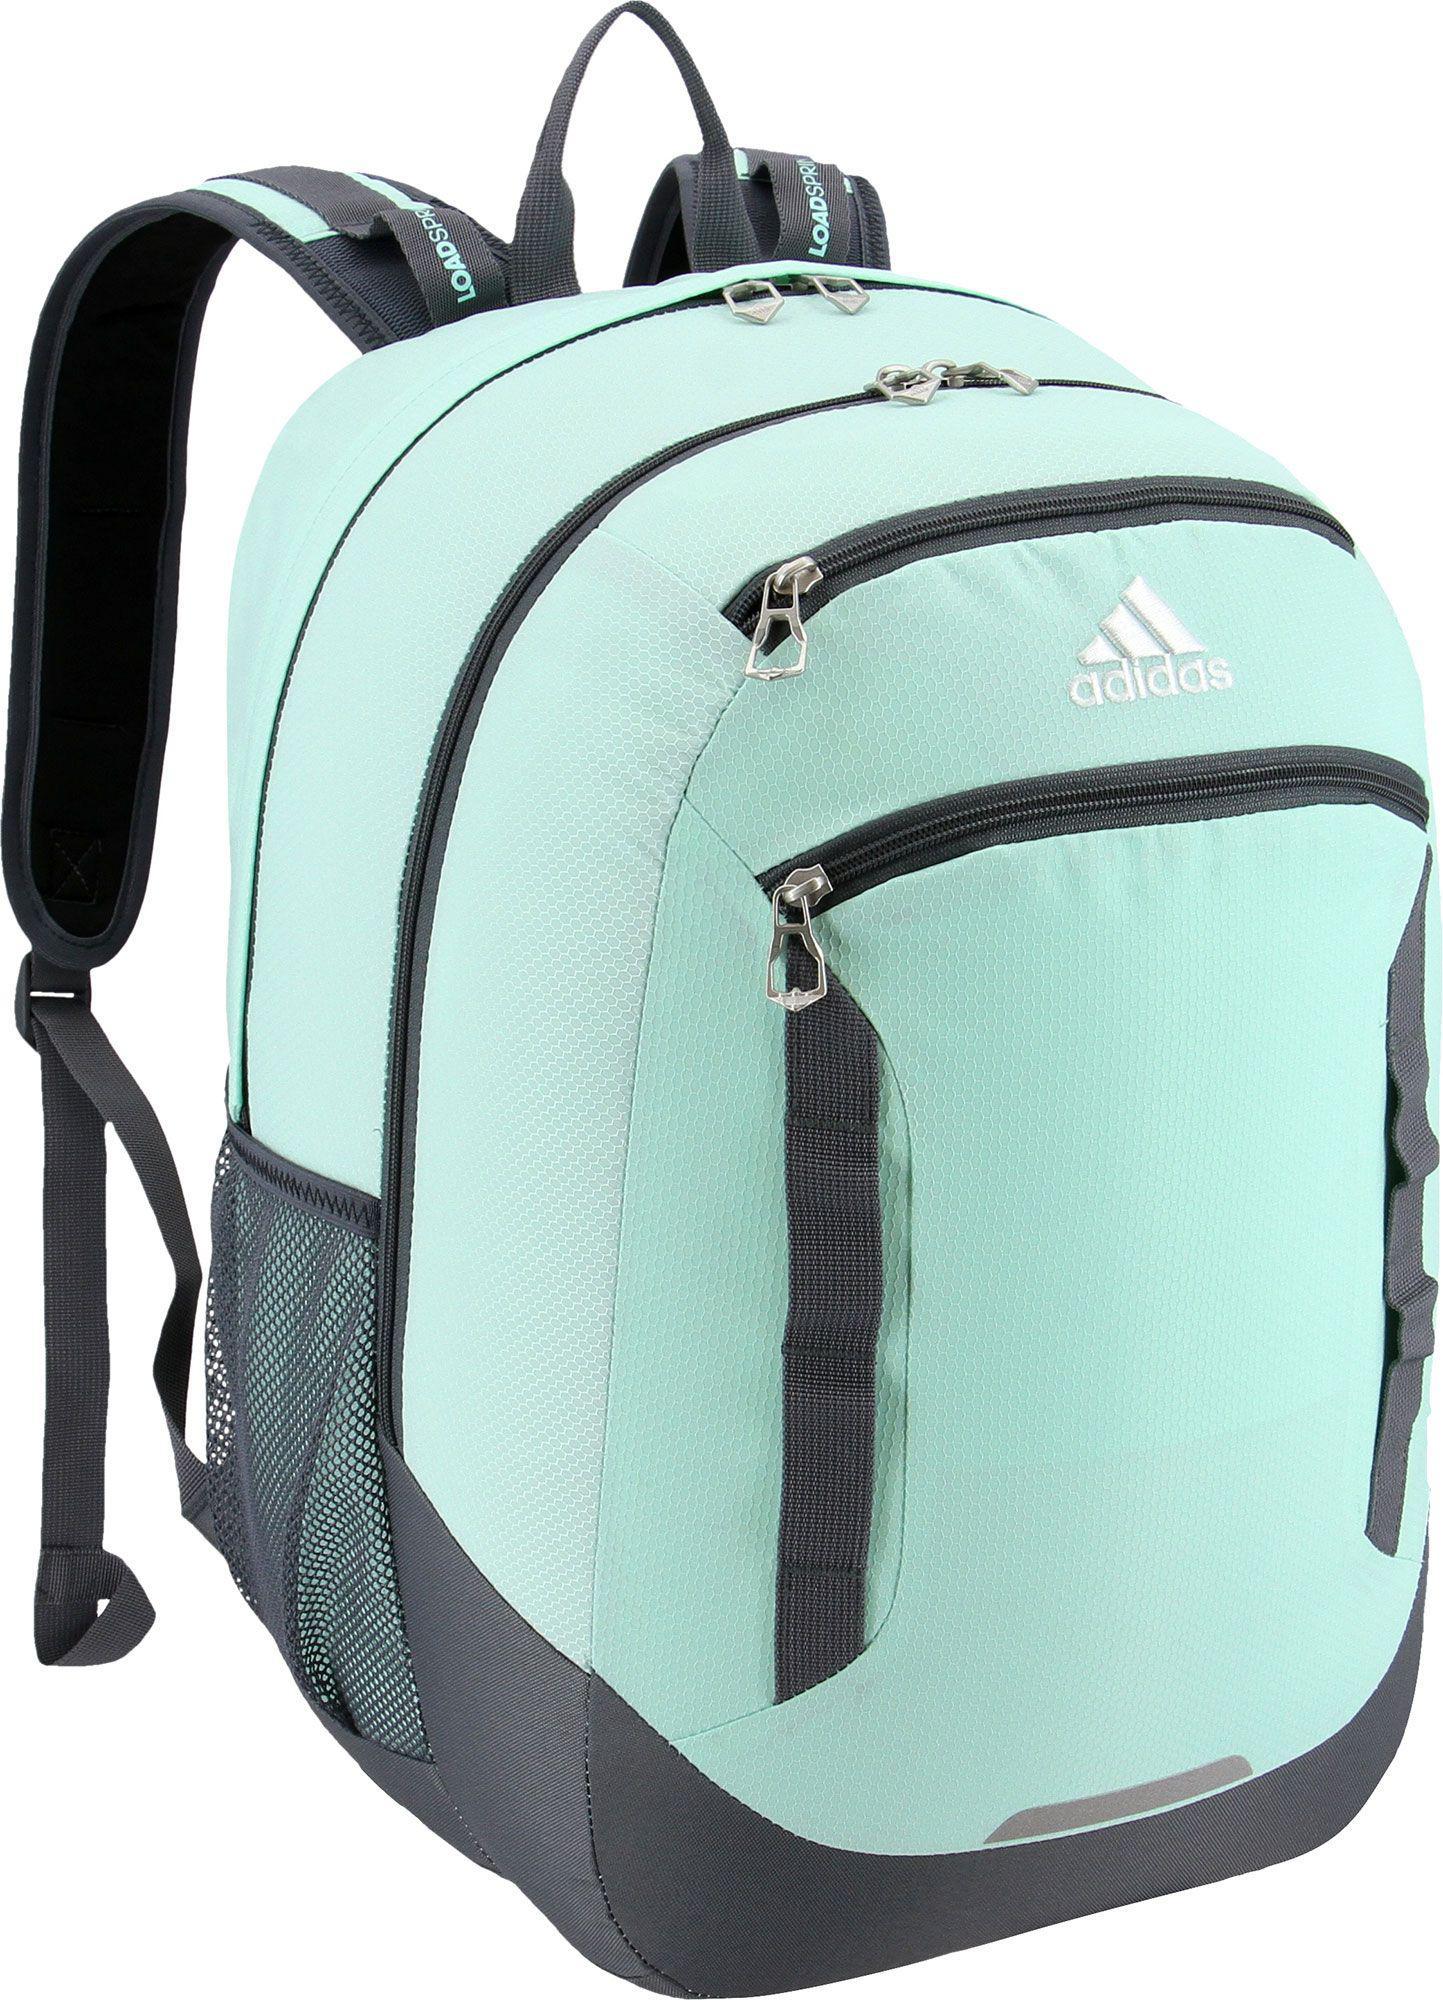 Adidas - Multicolor Excel Iii Backpack - Lyst aae8089206c1b